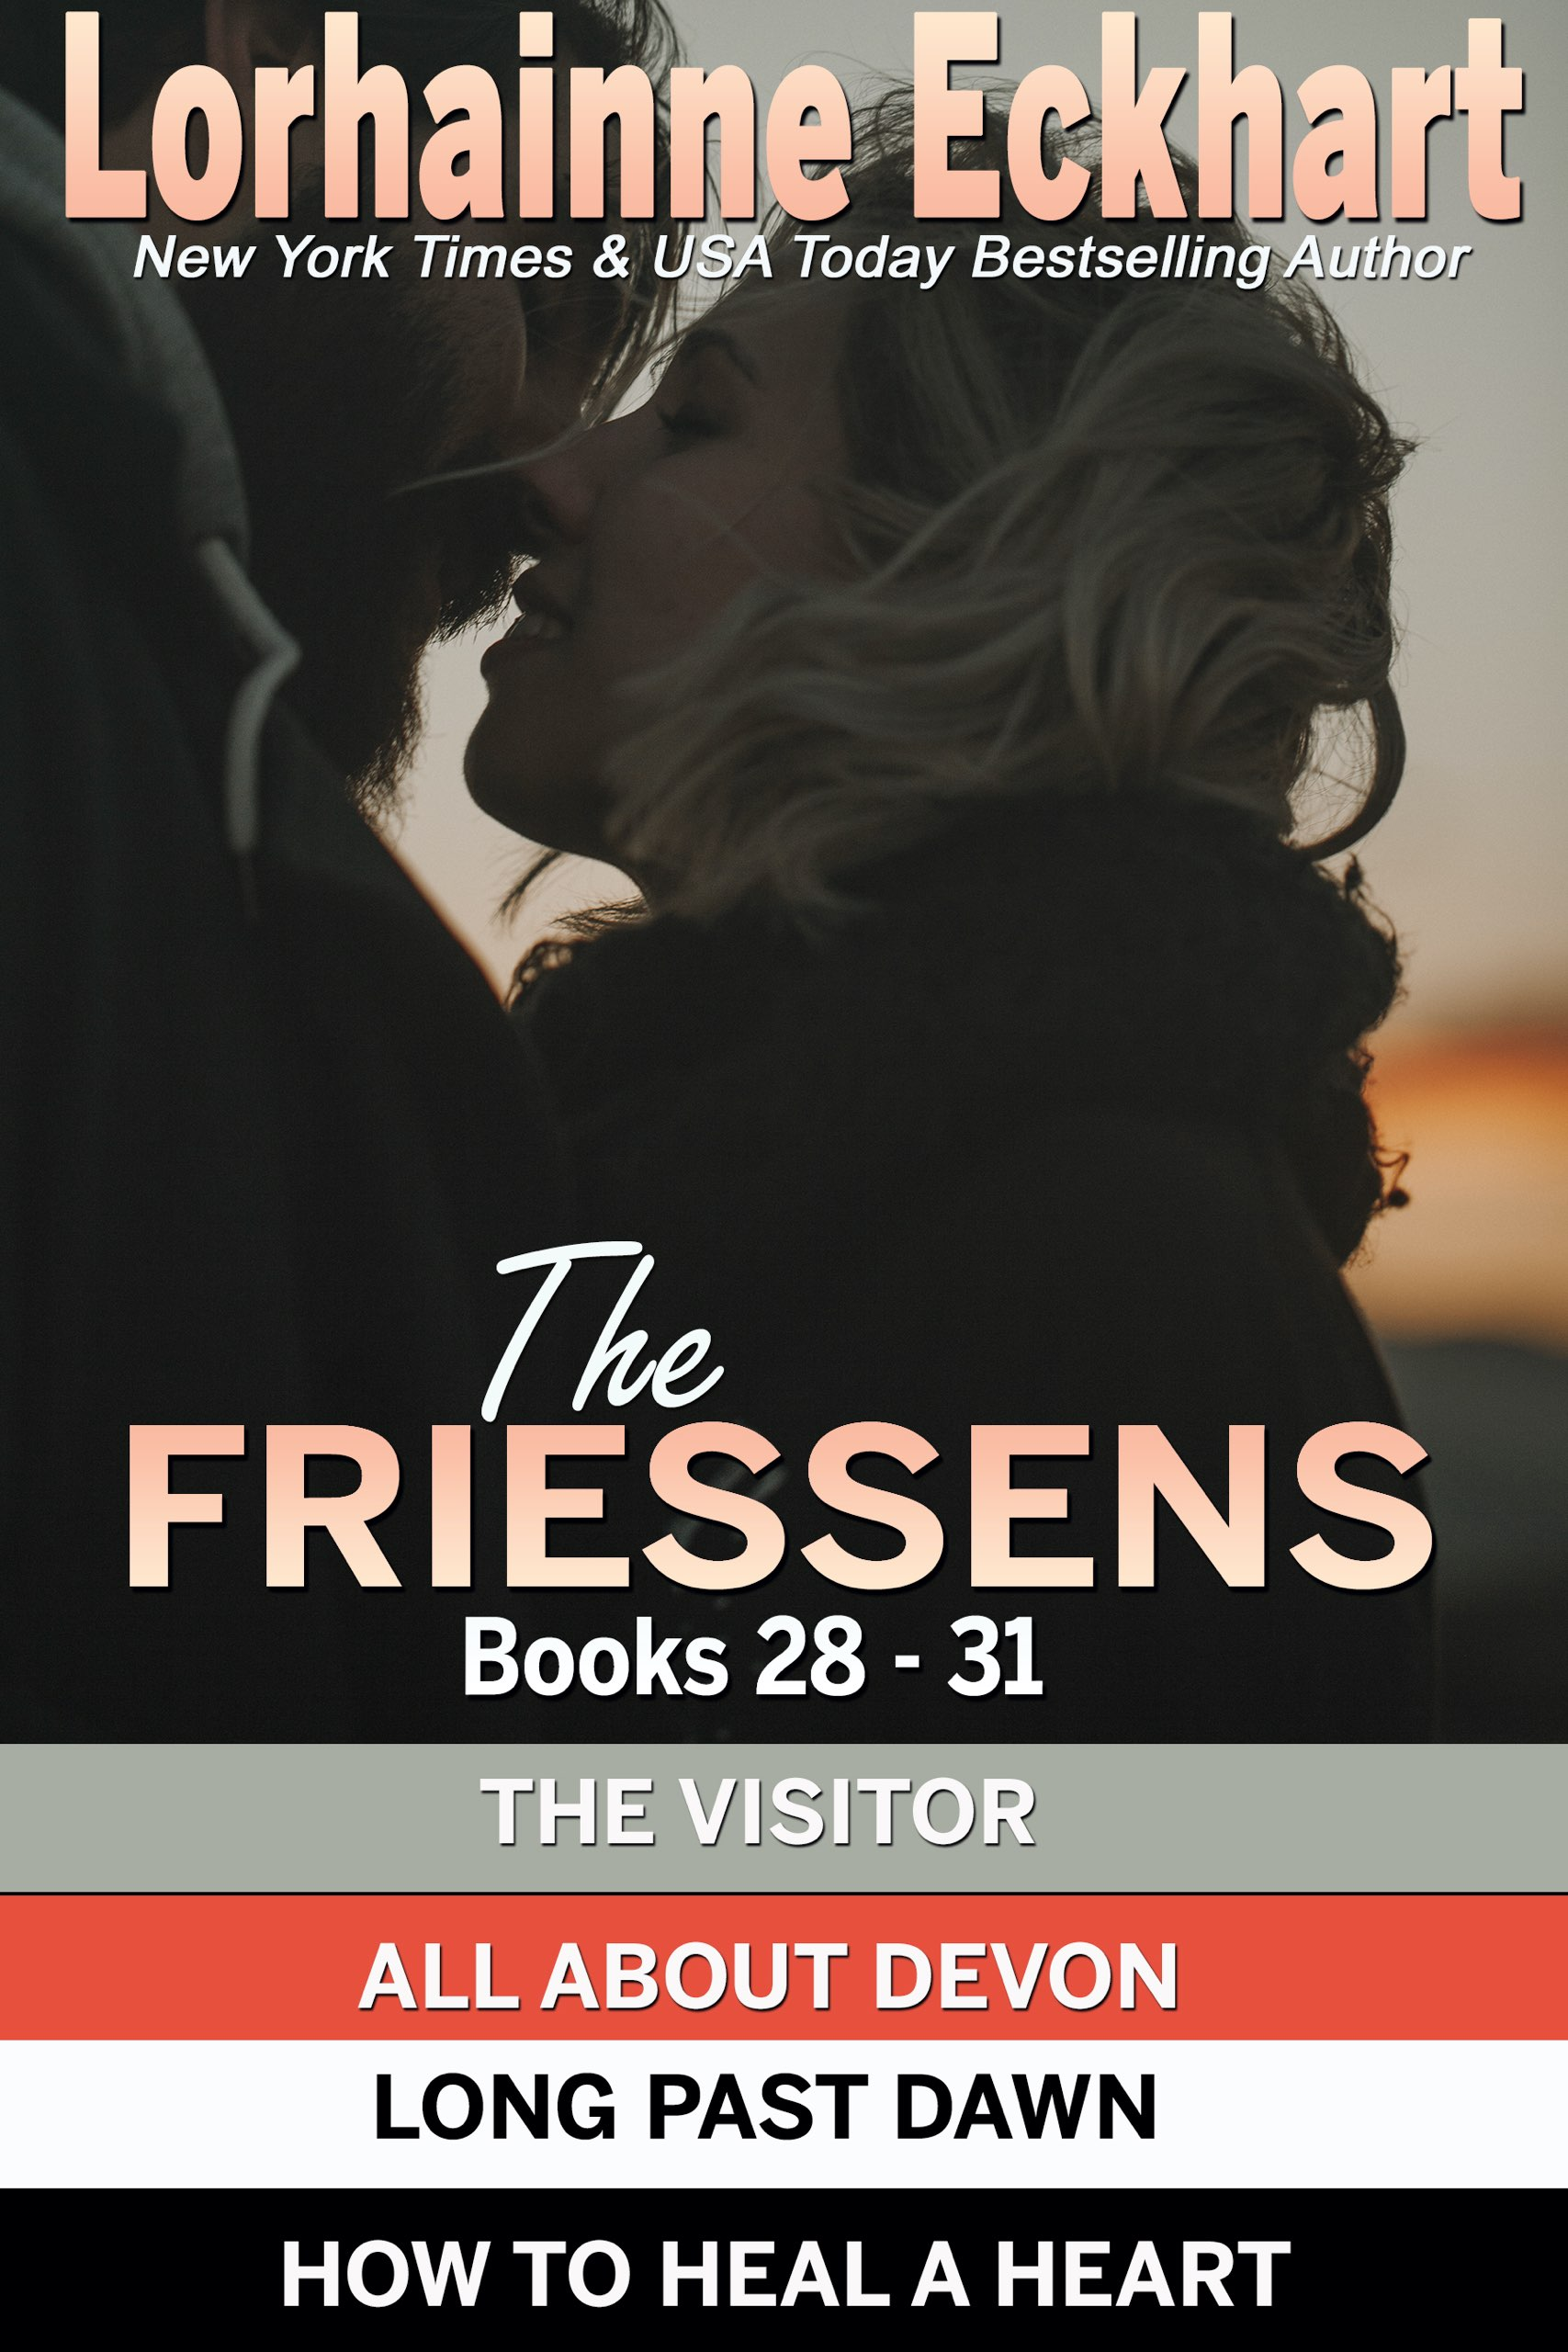 The Friessens Books 28 – 31